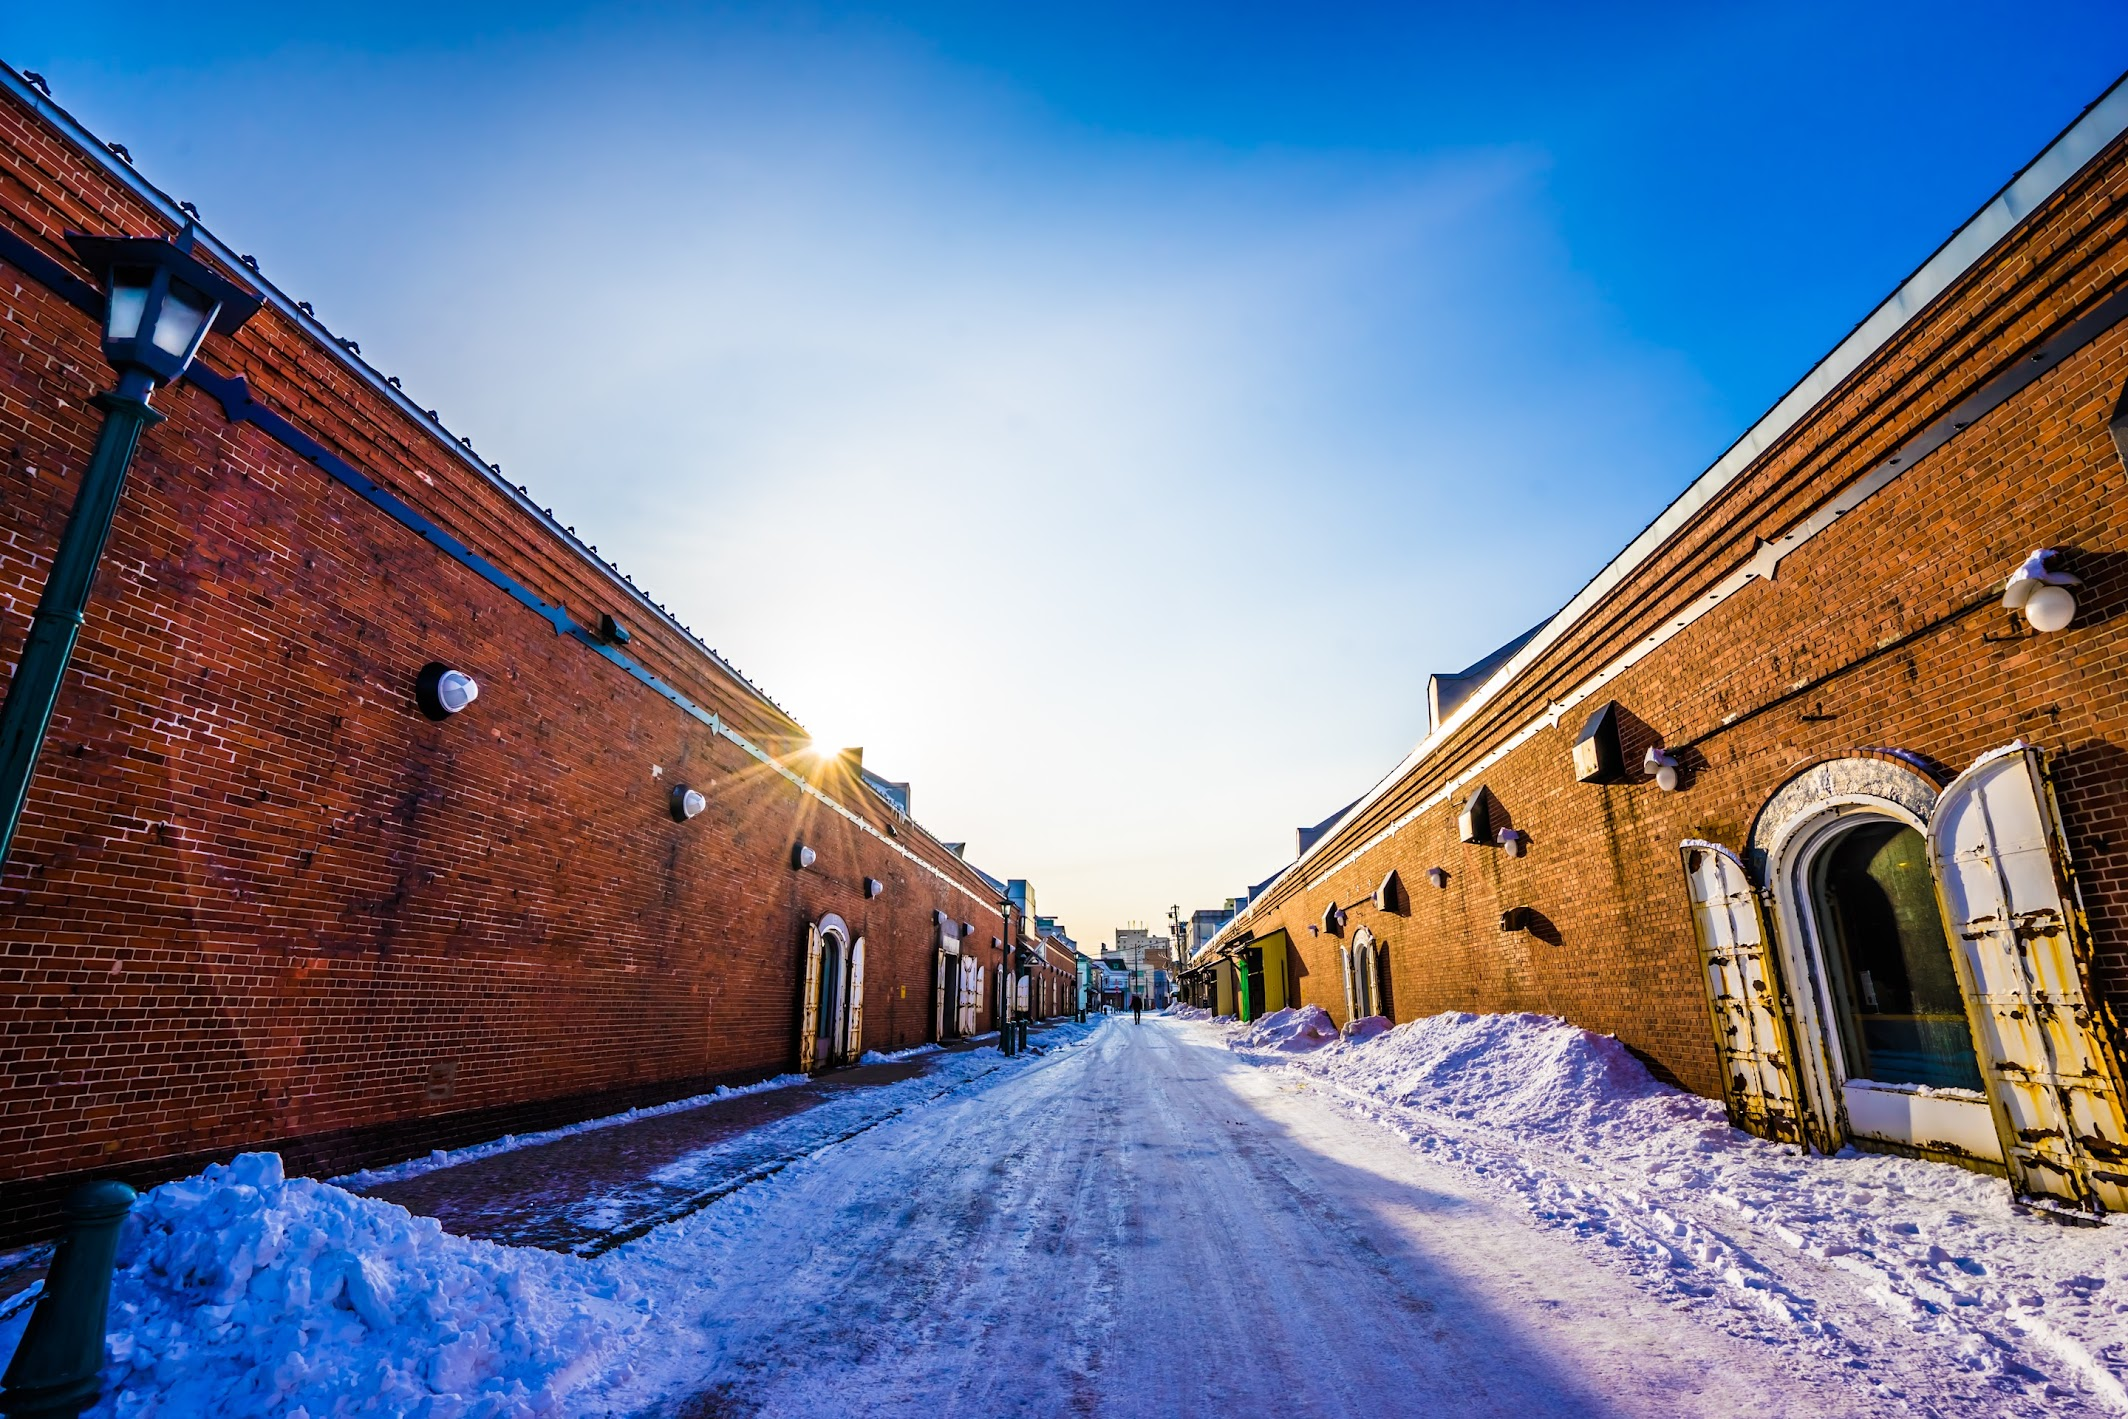 Hakodate Kanemori Red Brick Warehouse4